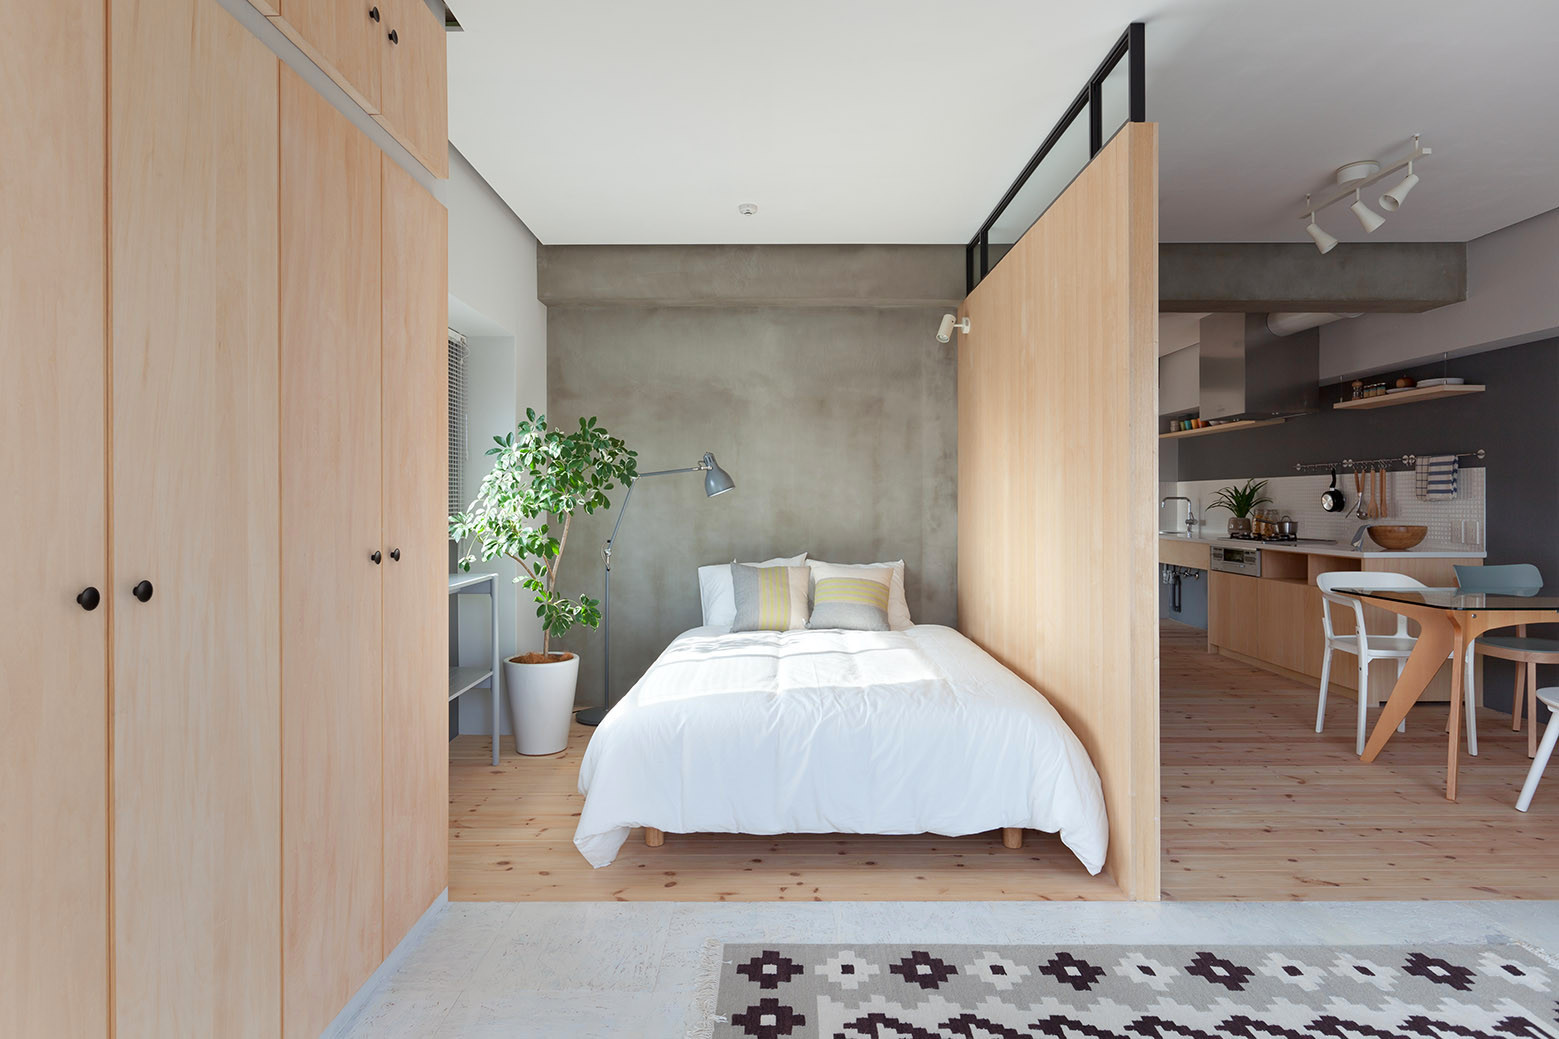 дървена преграда загражда две спални - 7